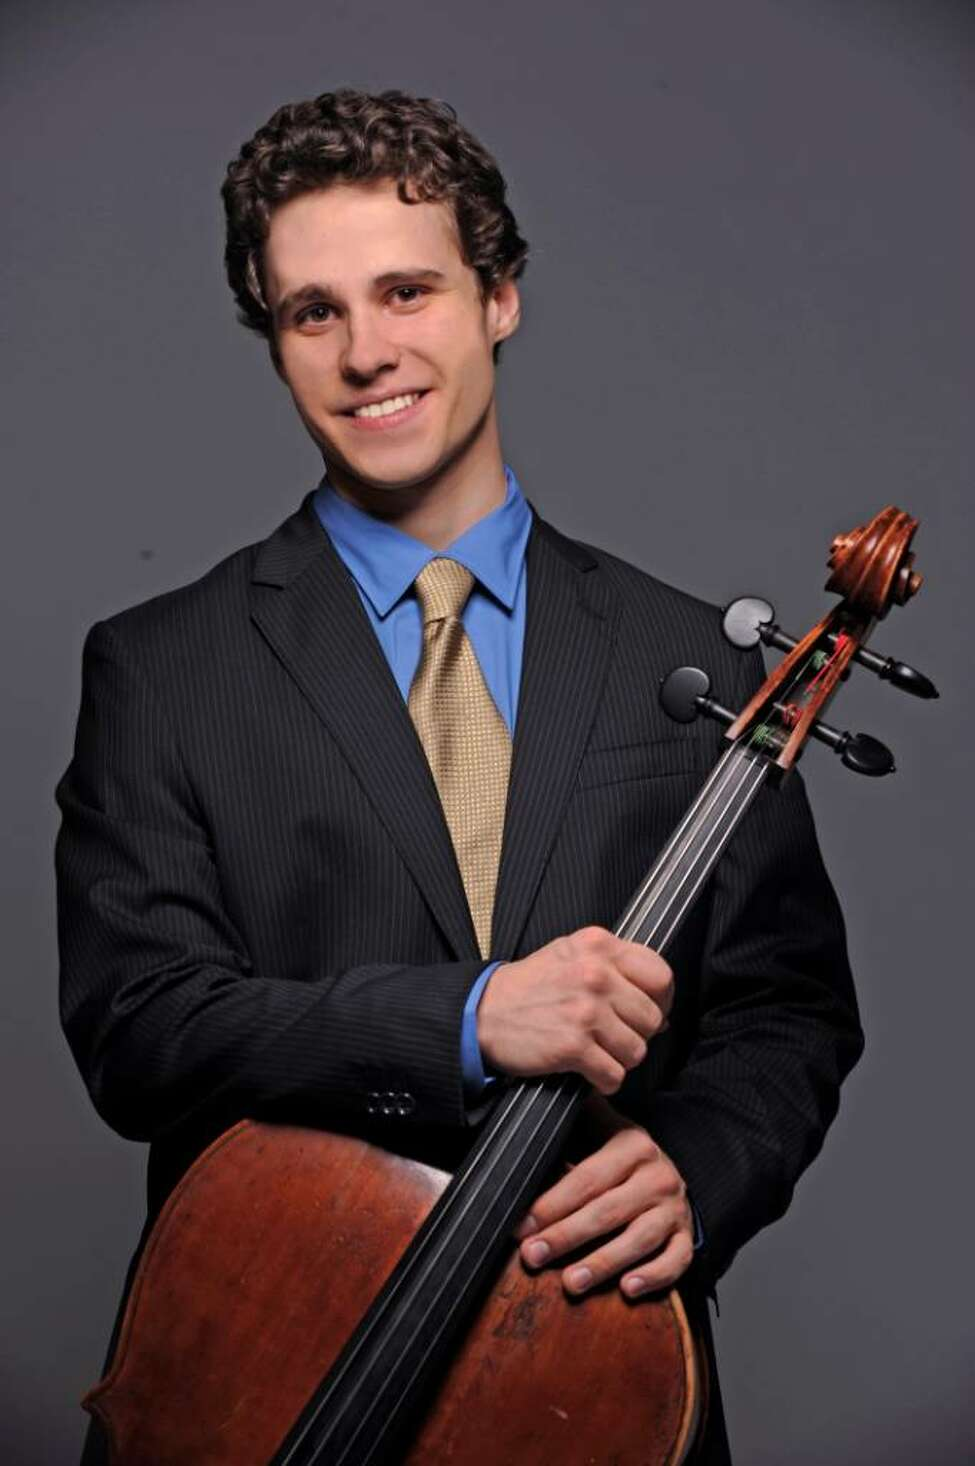 Juilliard student-cellist Dane Johanson.